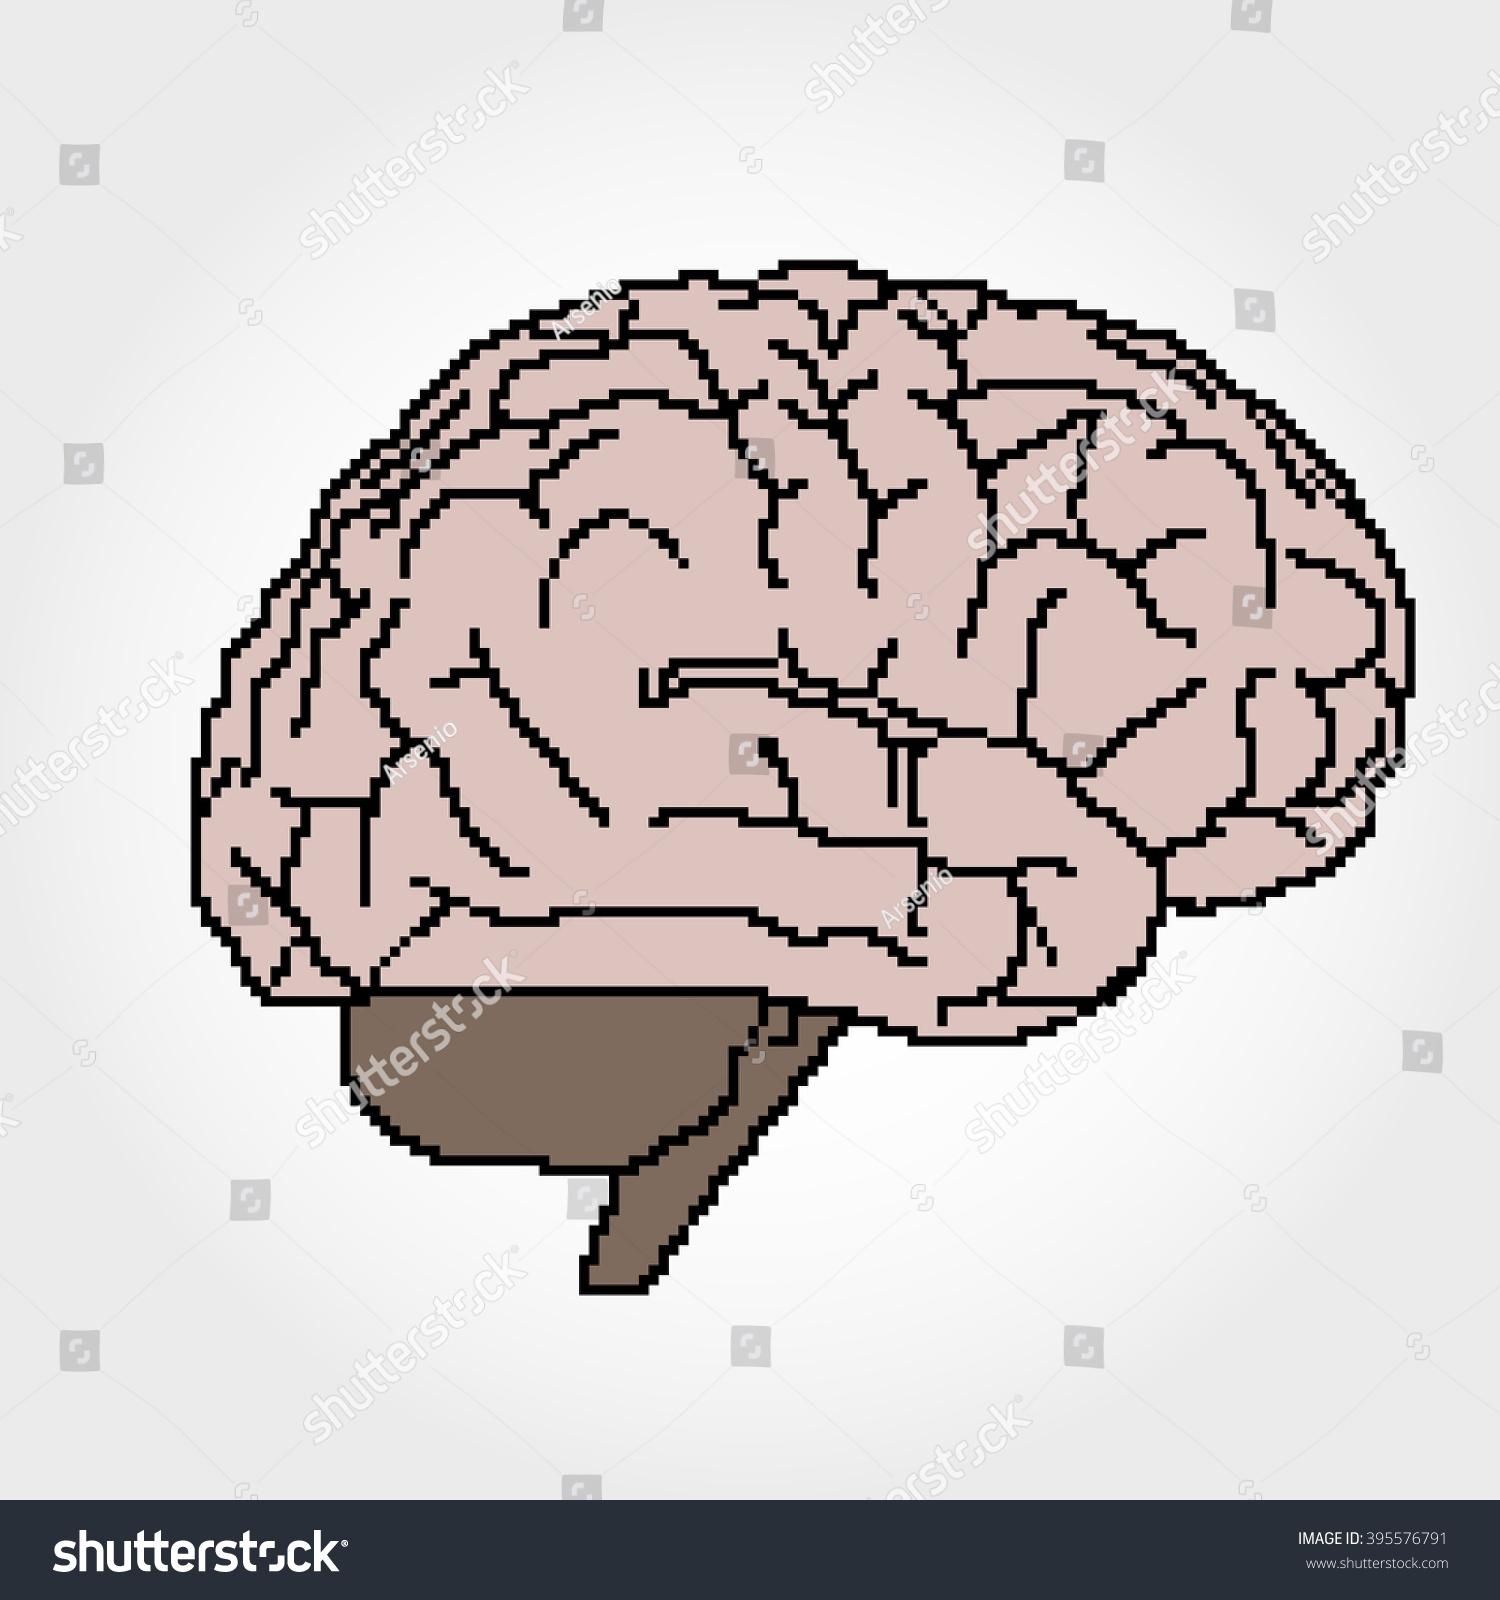 Awesome Human Brain In Pixel Art